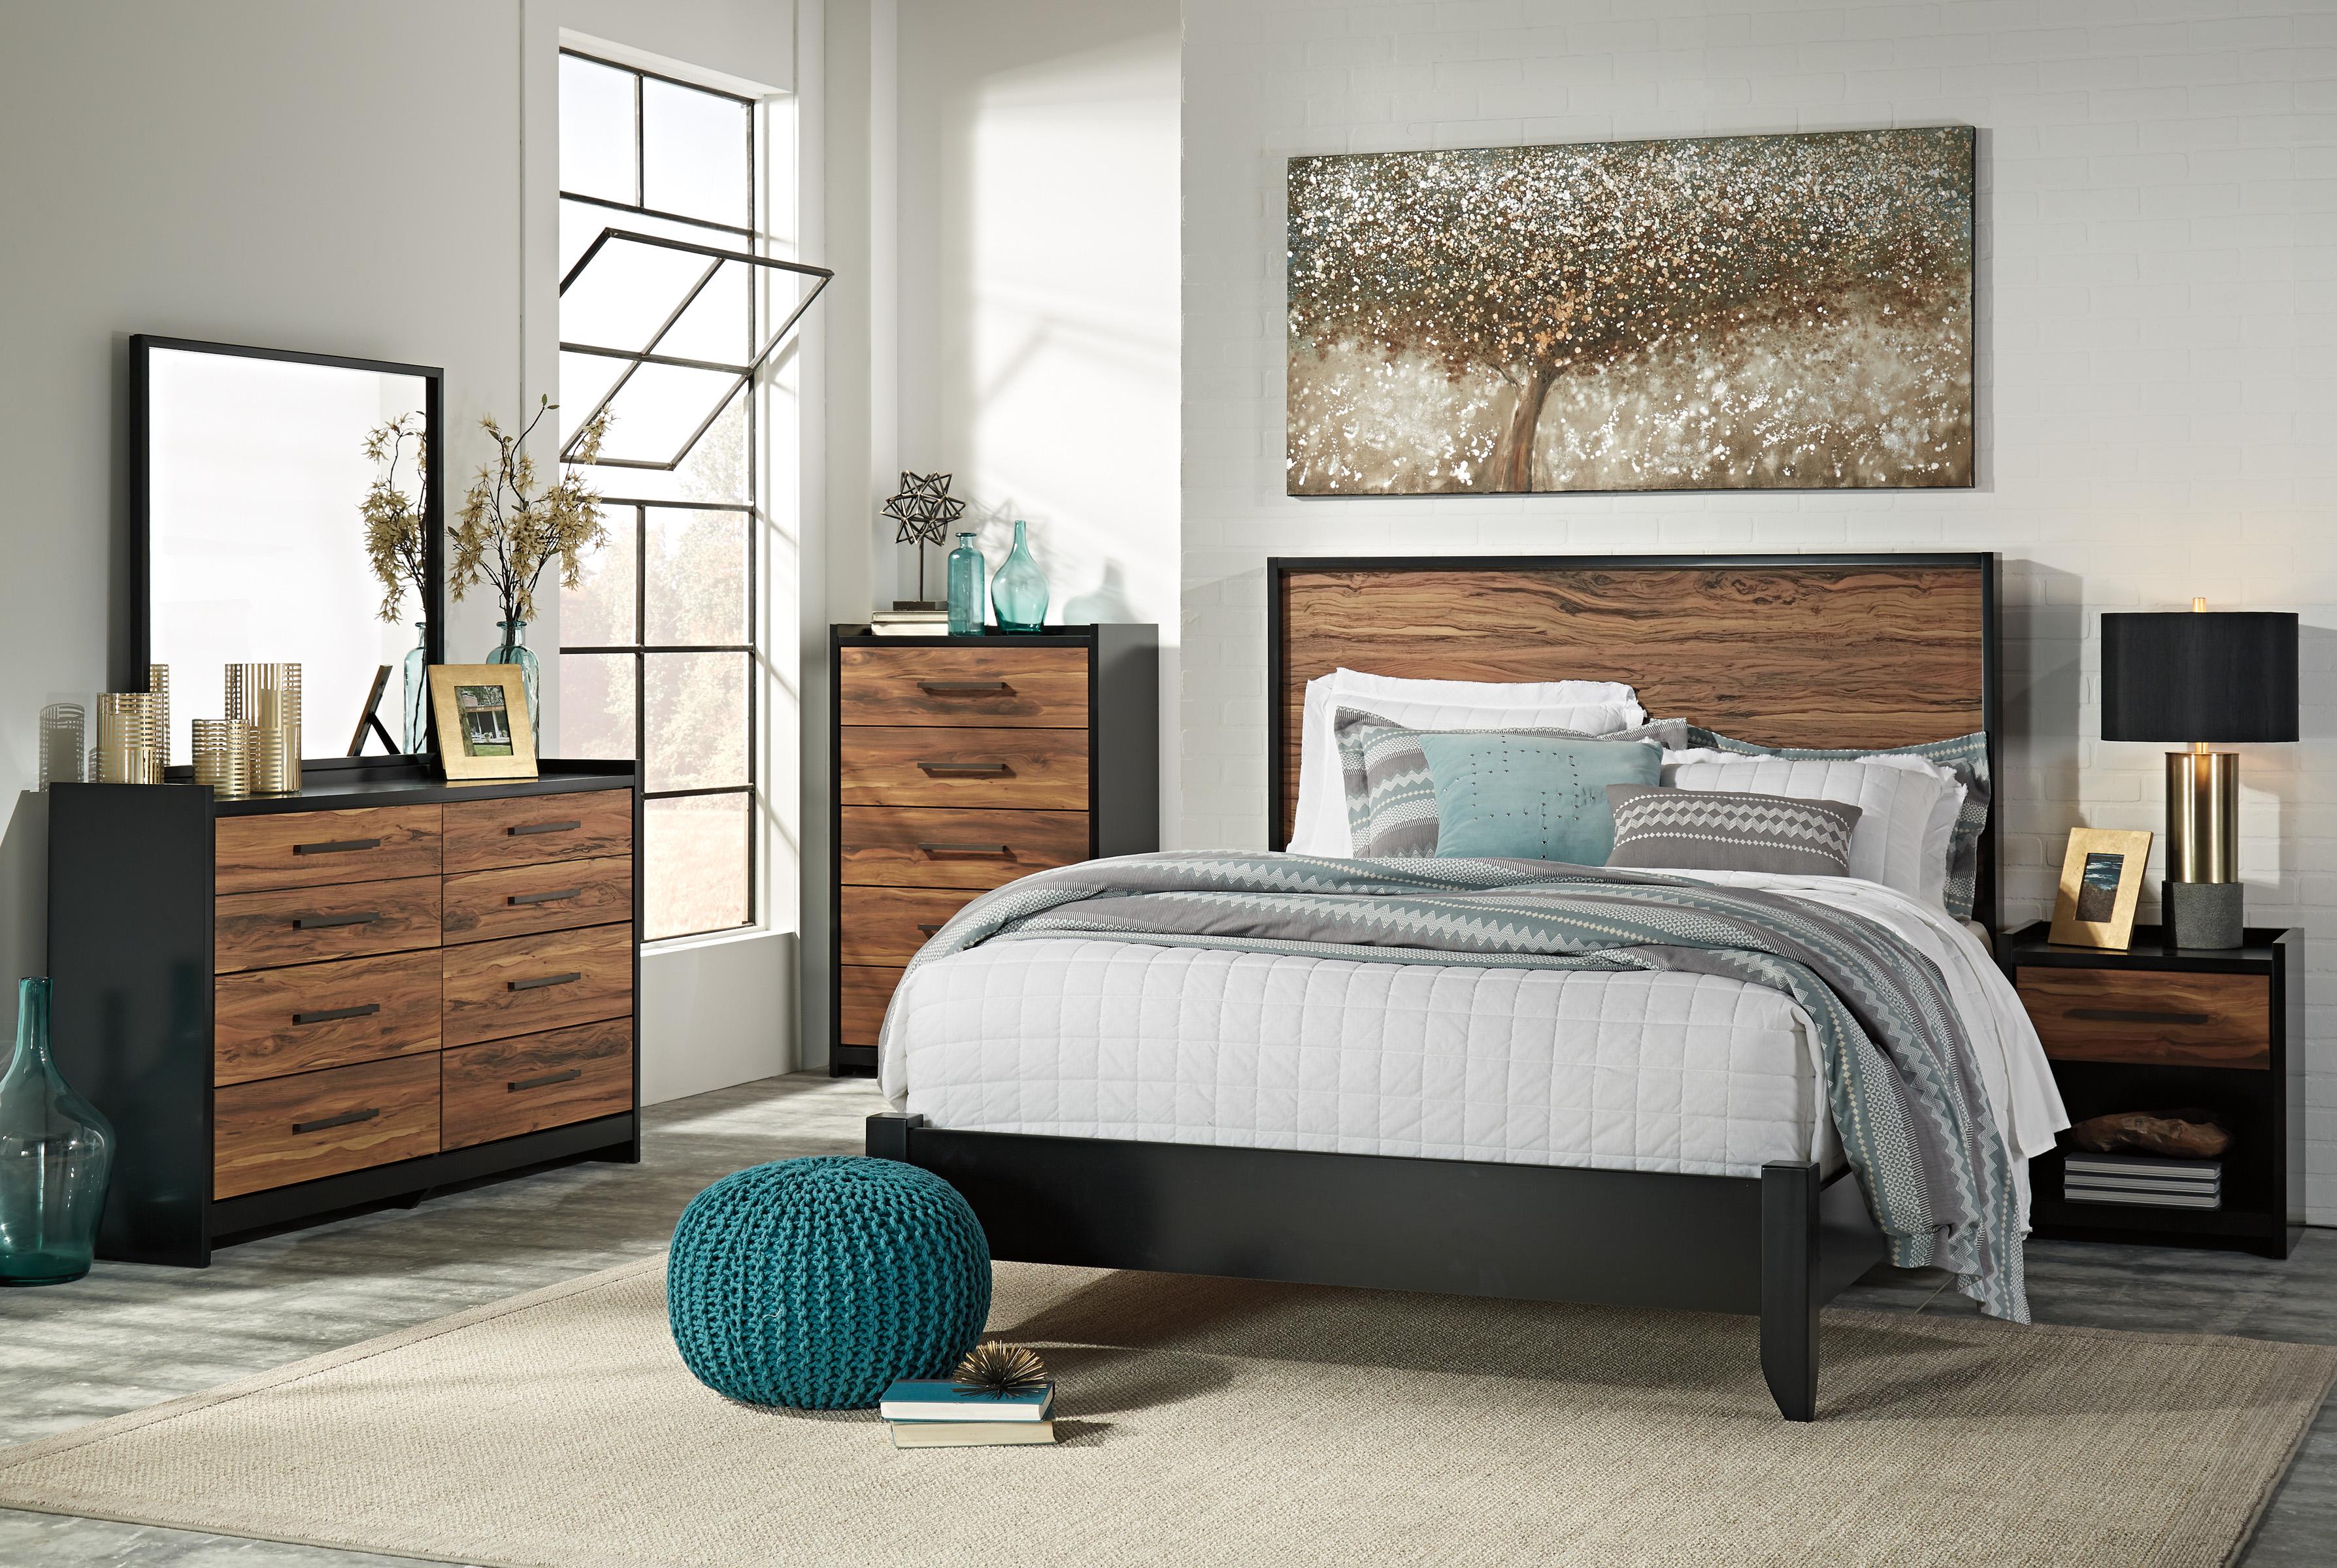 Stavani Black Brown Bedroom Set Marjen Of Chicago Chicago Discount Furniture